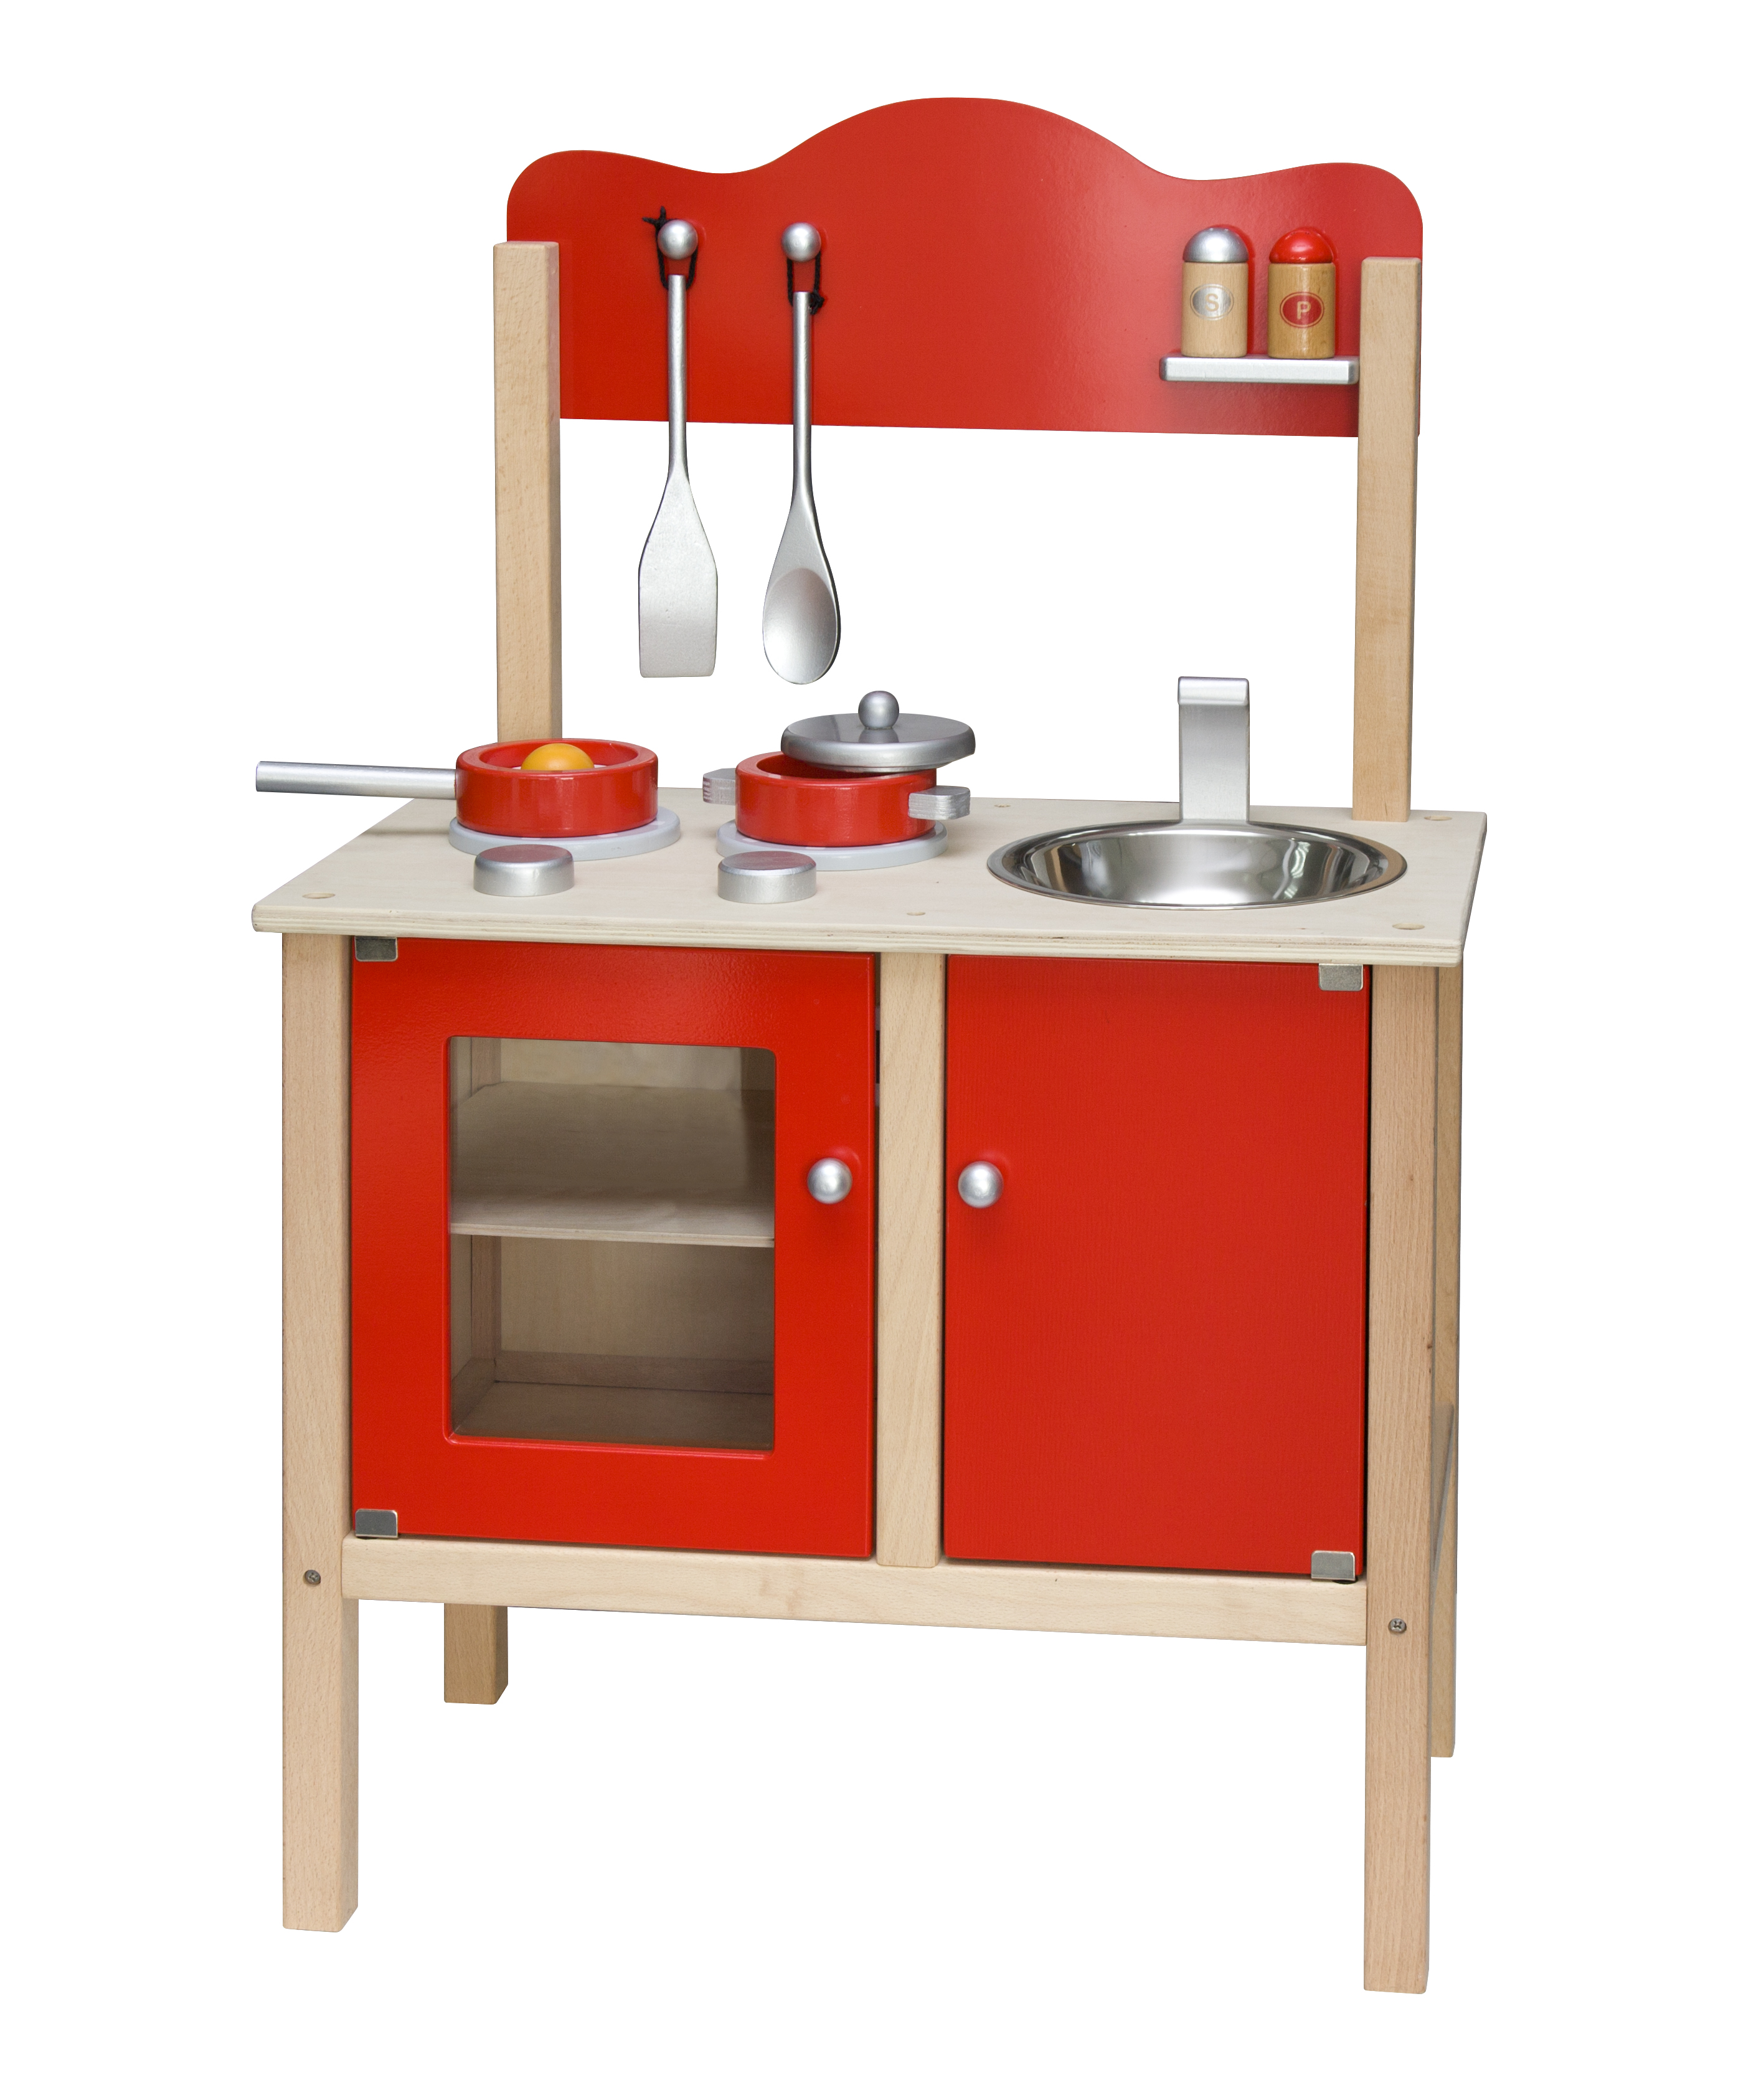 Wooden Kitchen Accessories Toys: Viga Toys Noble Wooden Kitchen With Accessories